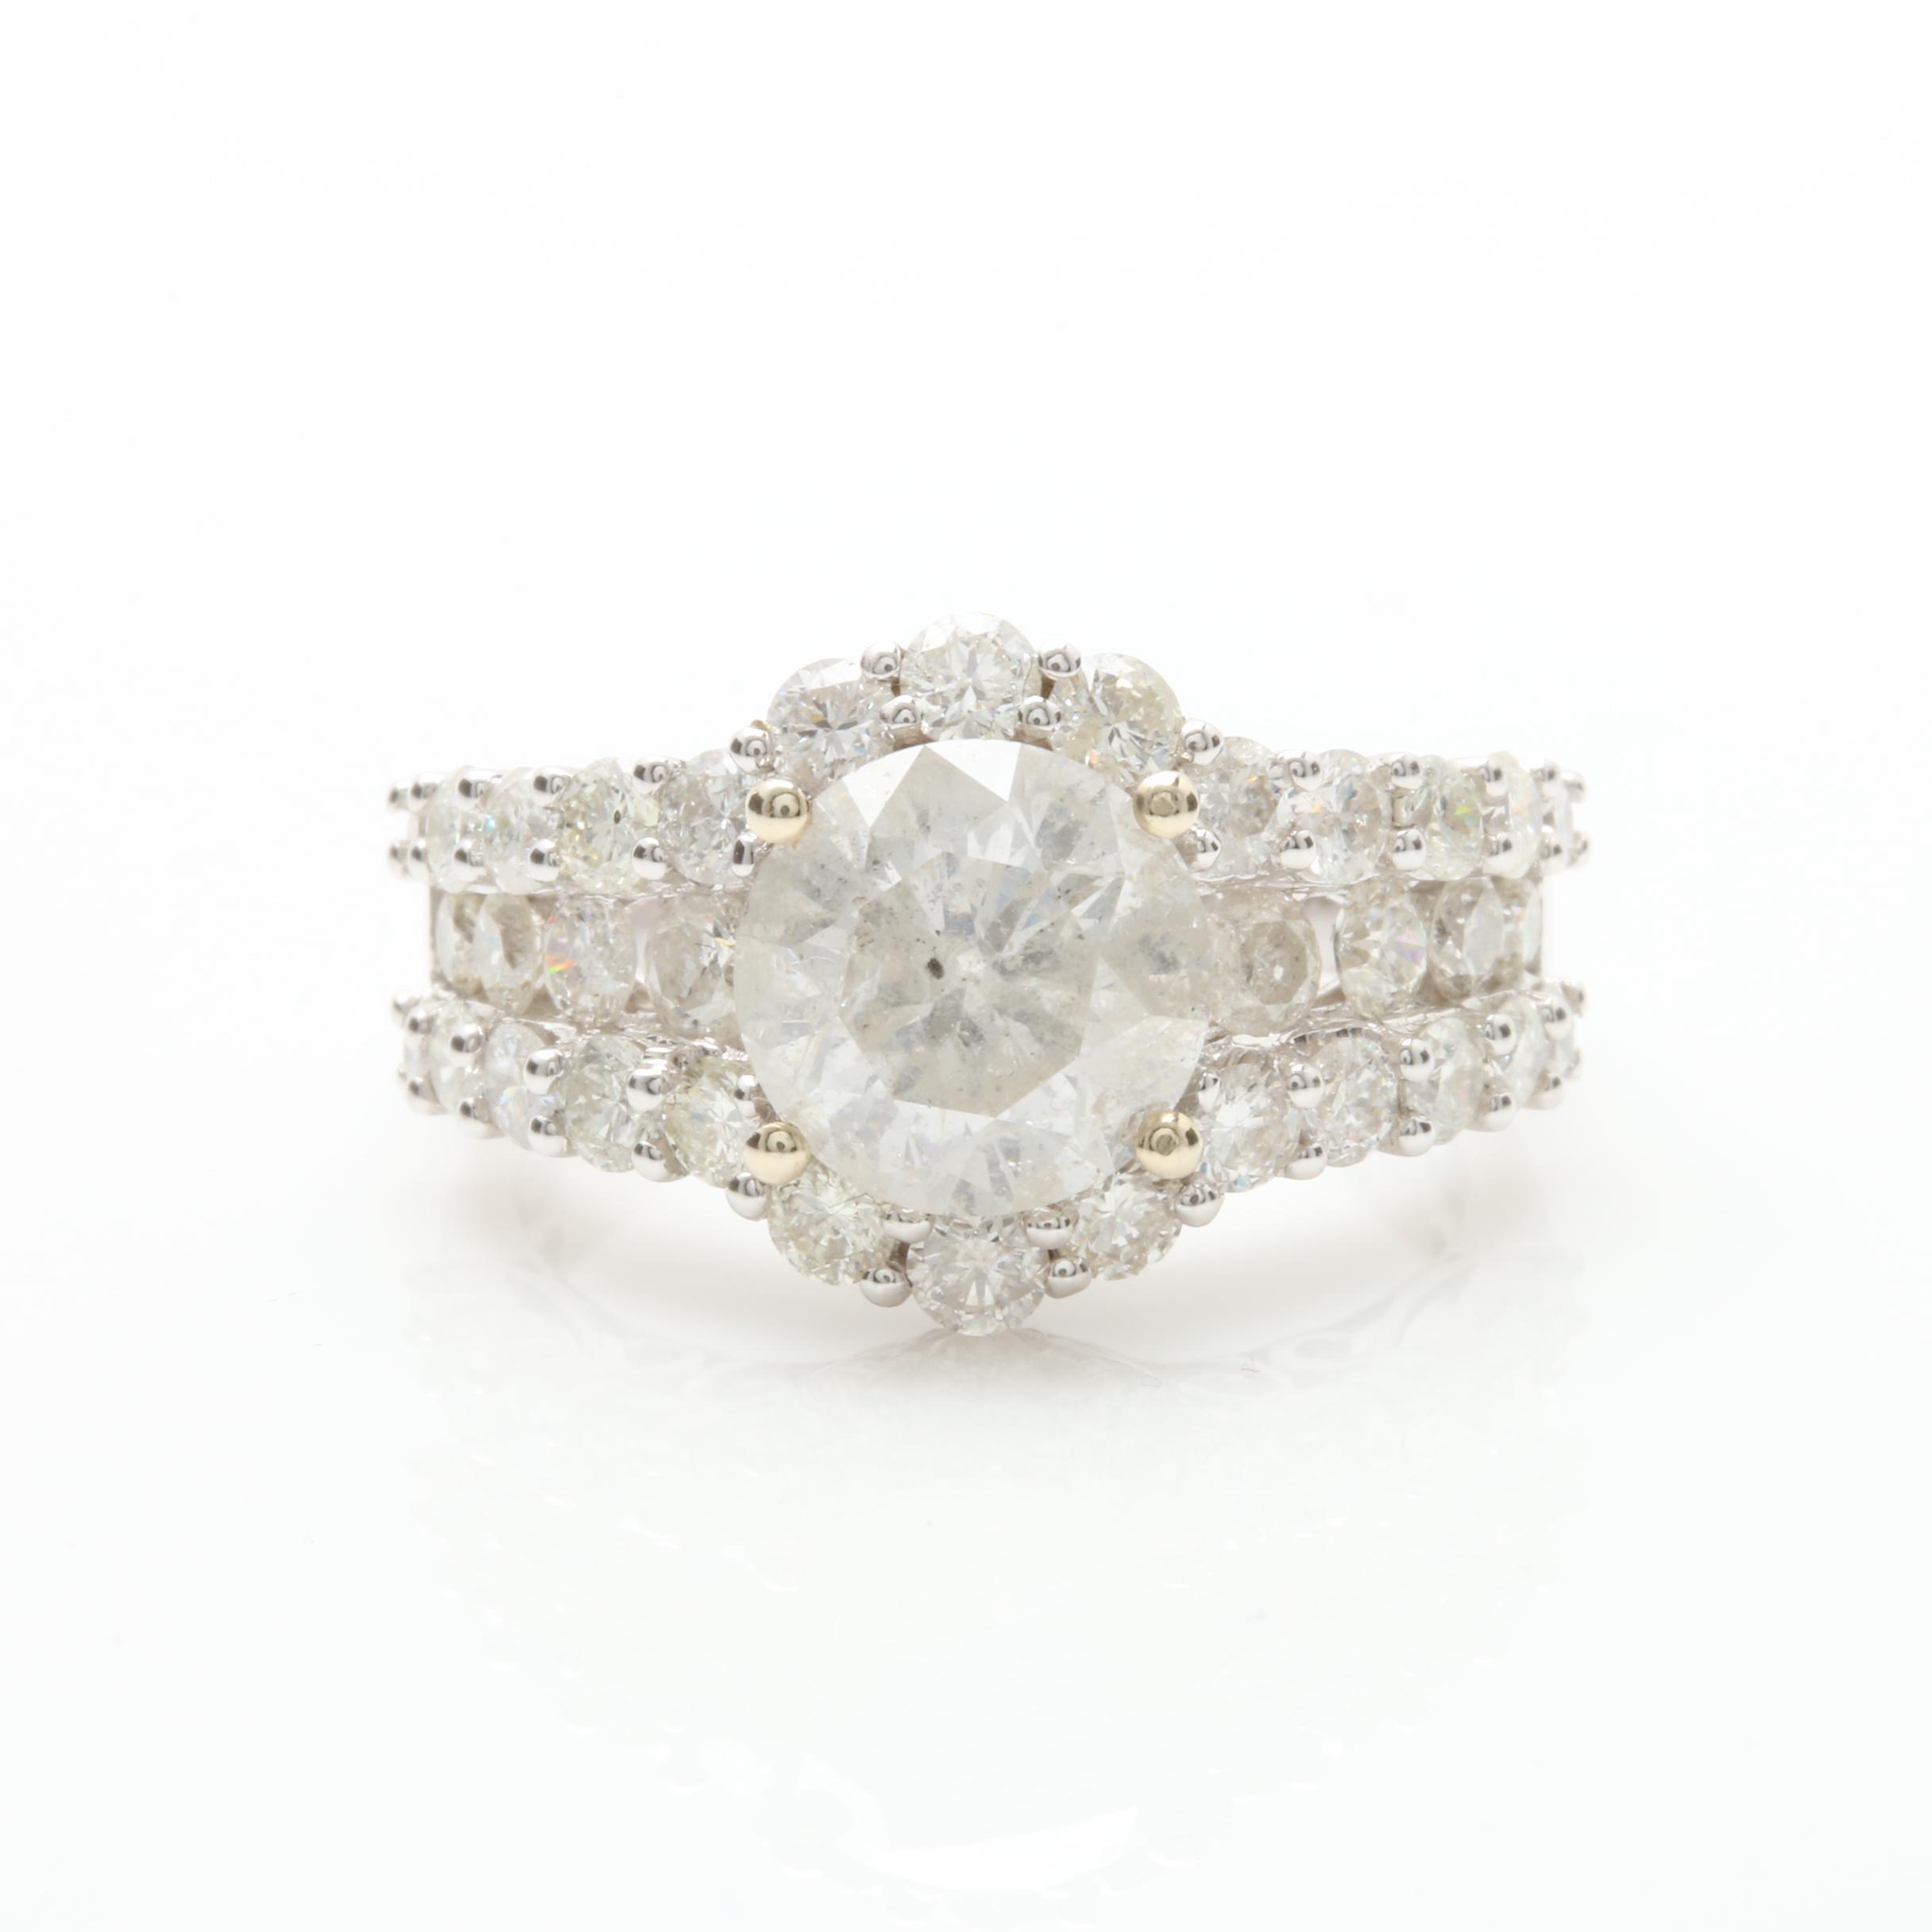 14K White Gold 3.97 CTW Diamond Ring